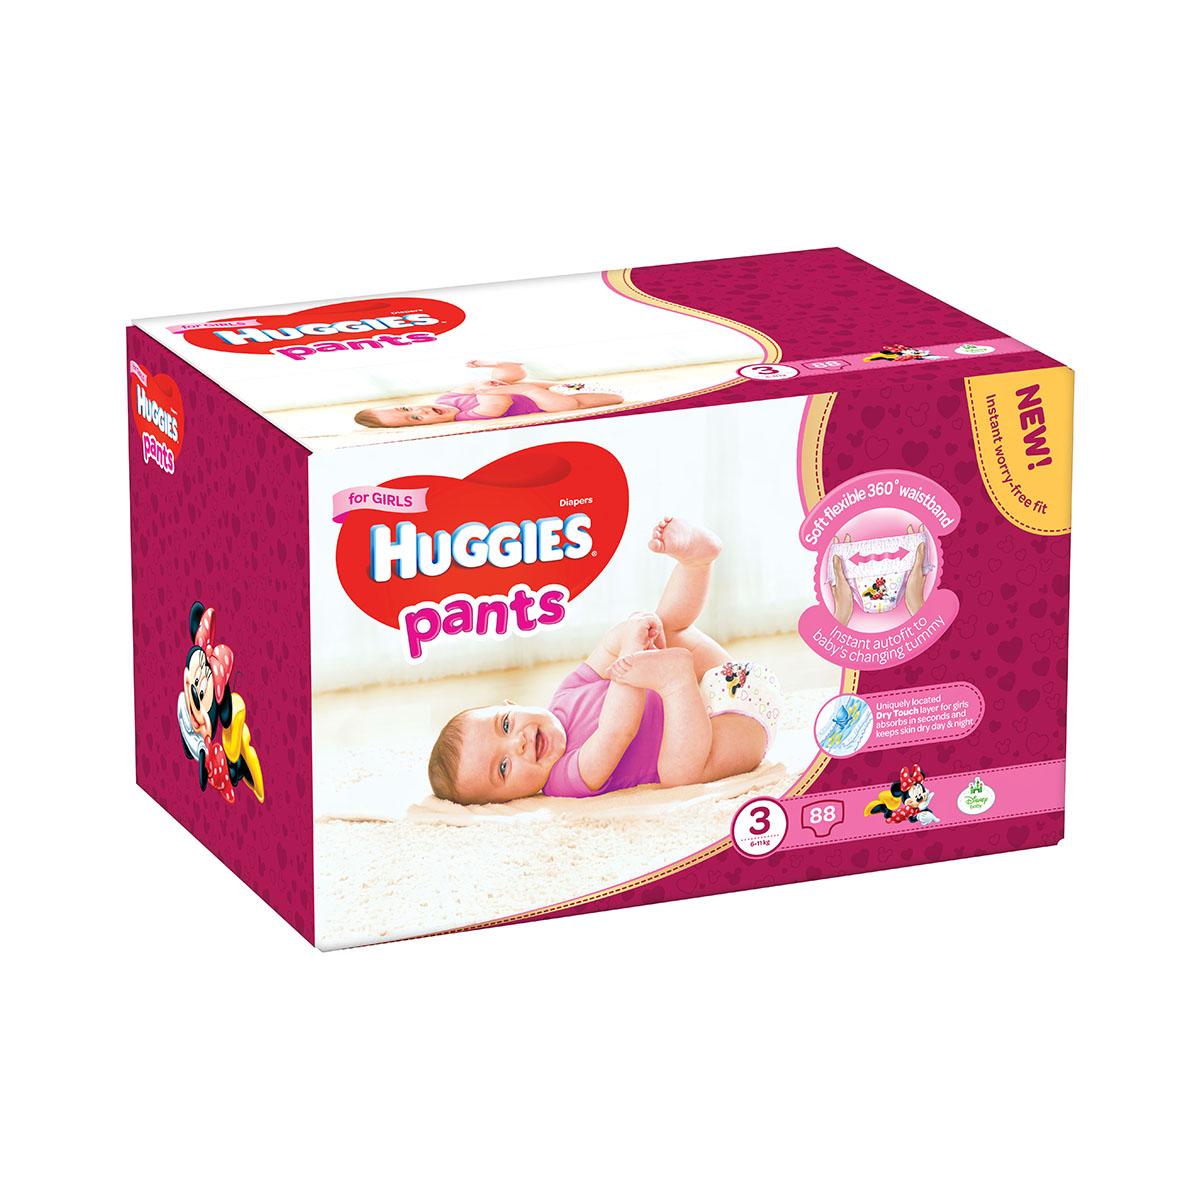 Scutece Huggies Pants Box Girls, Nr 3, 6 - 11 Kg, 88 buc imagine